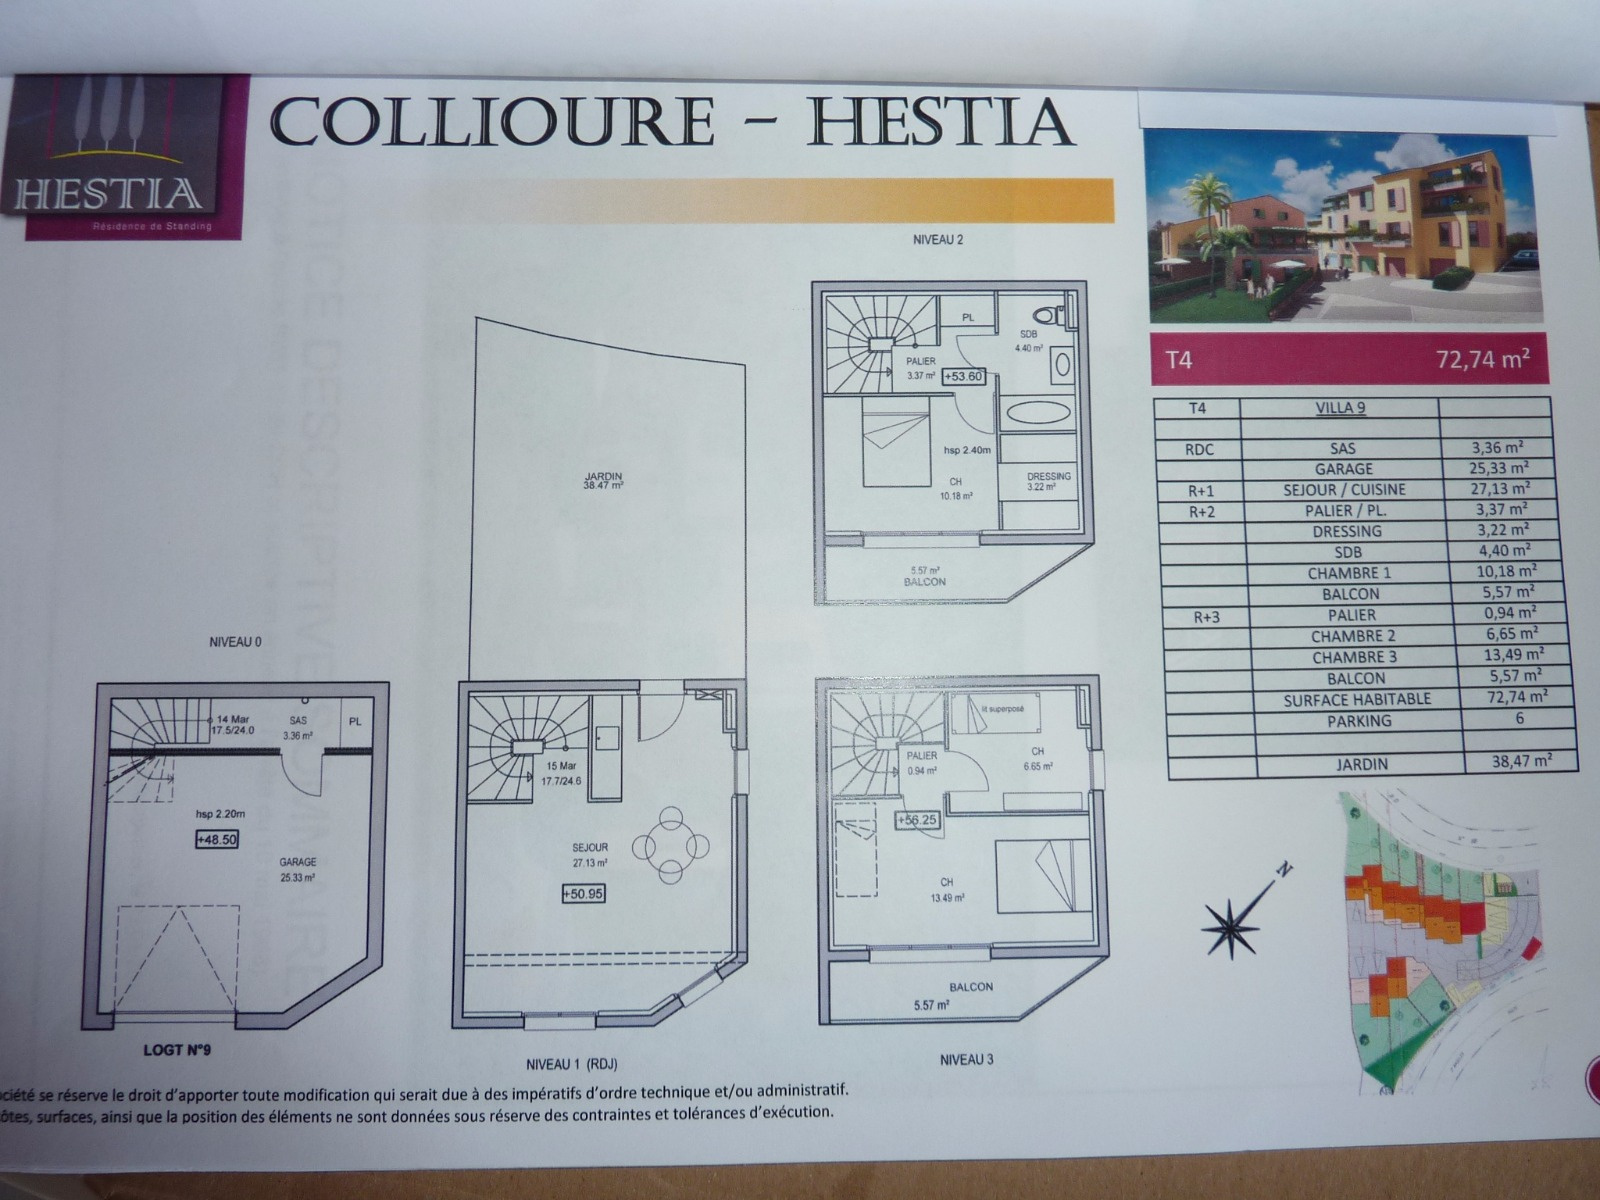 Vente villa 4 pi ces neuve collioure for Acheter maison collioure